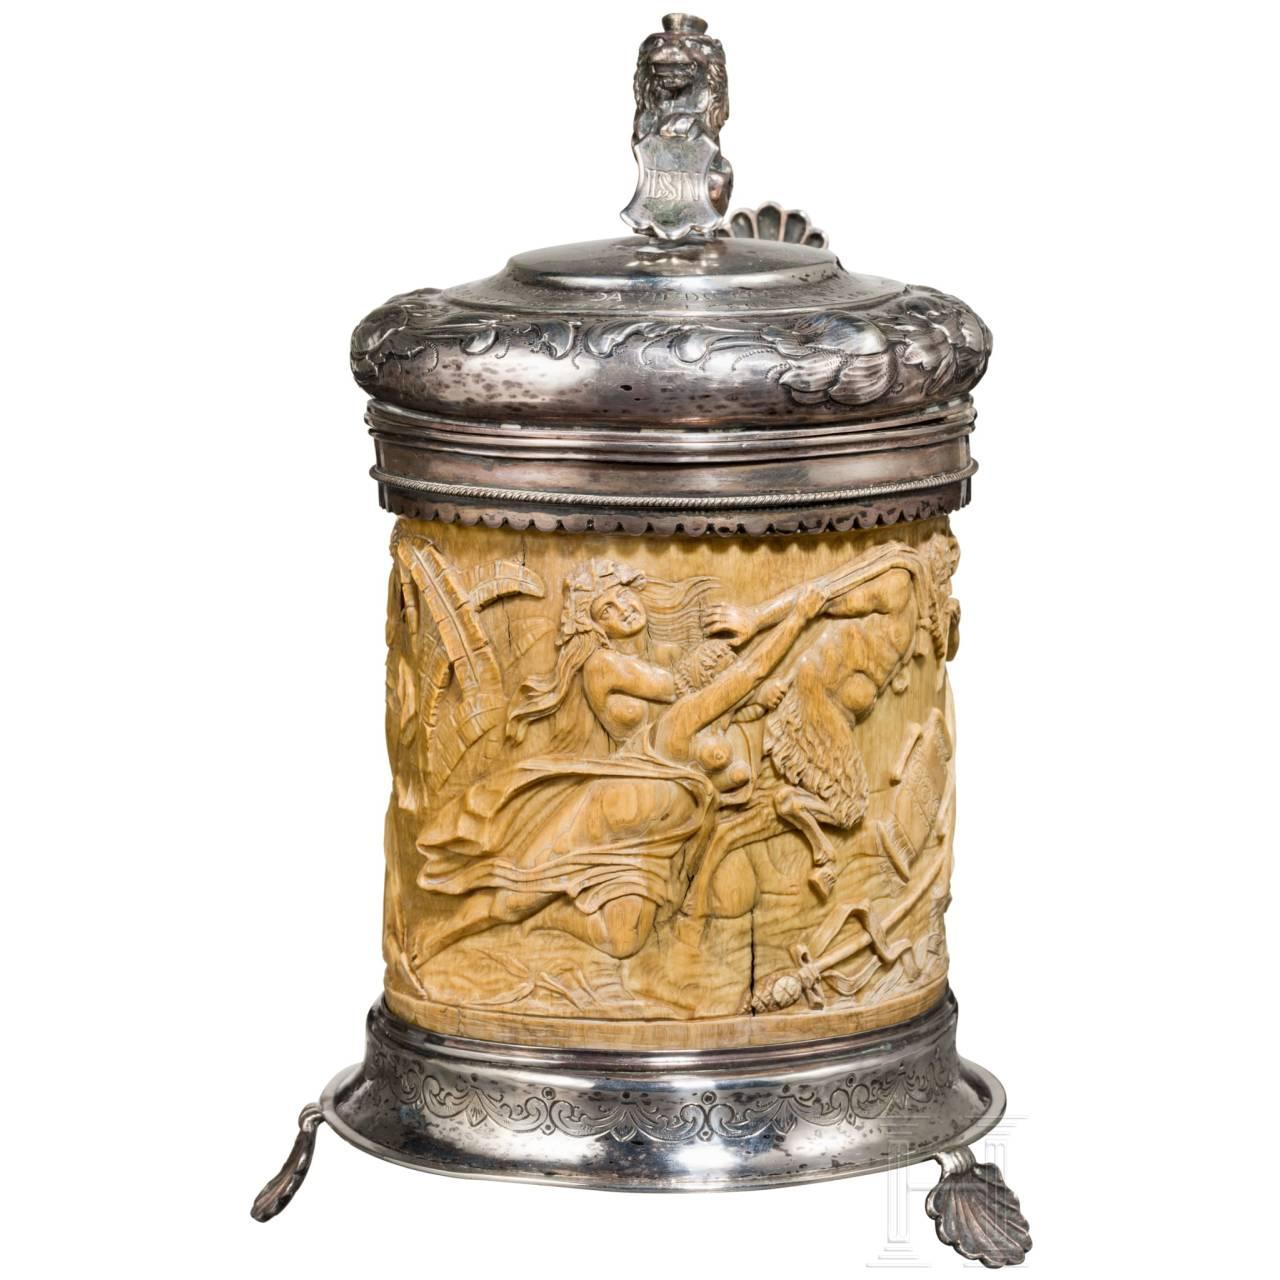 A Danish silver-mounted ivory tankard, 18th/19th century